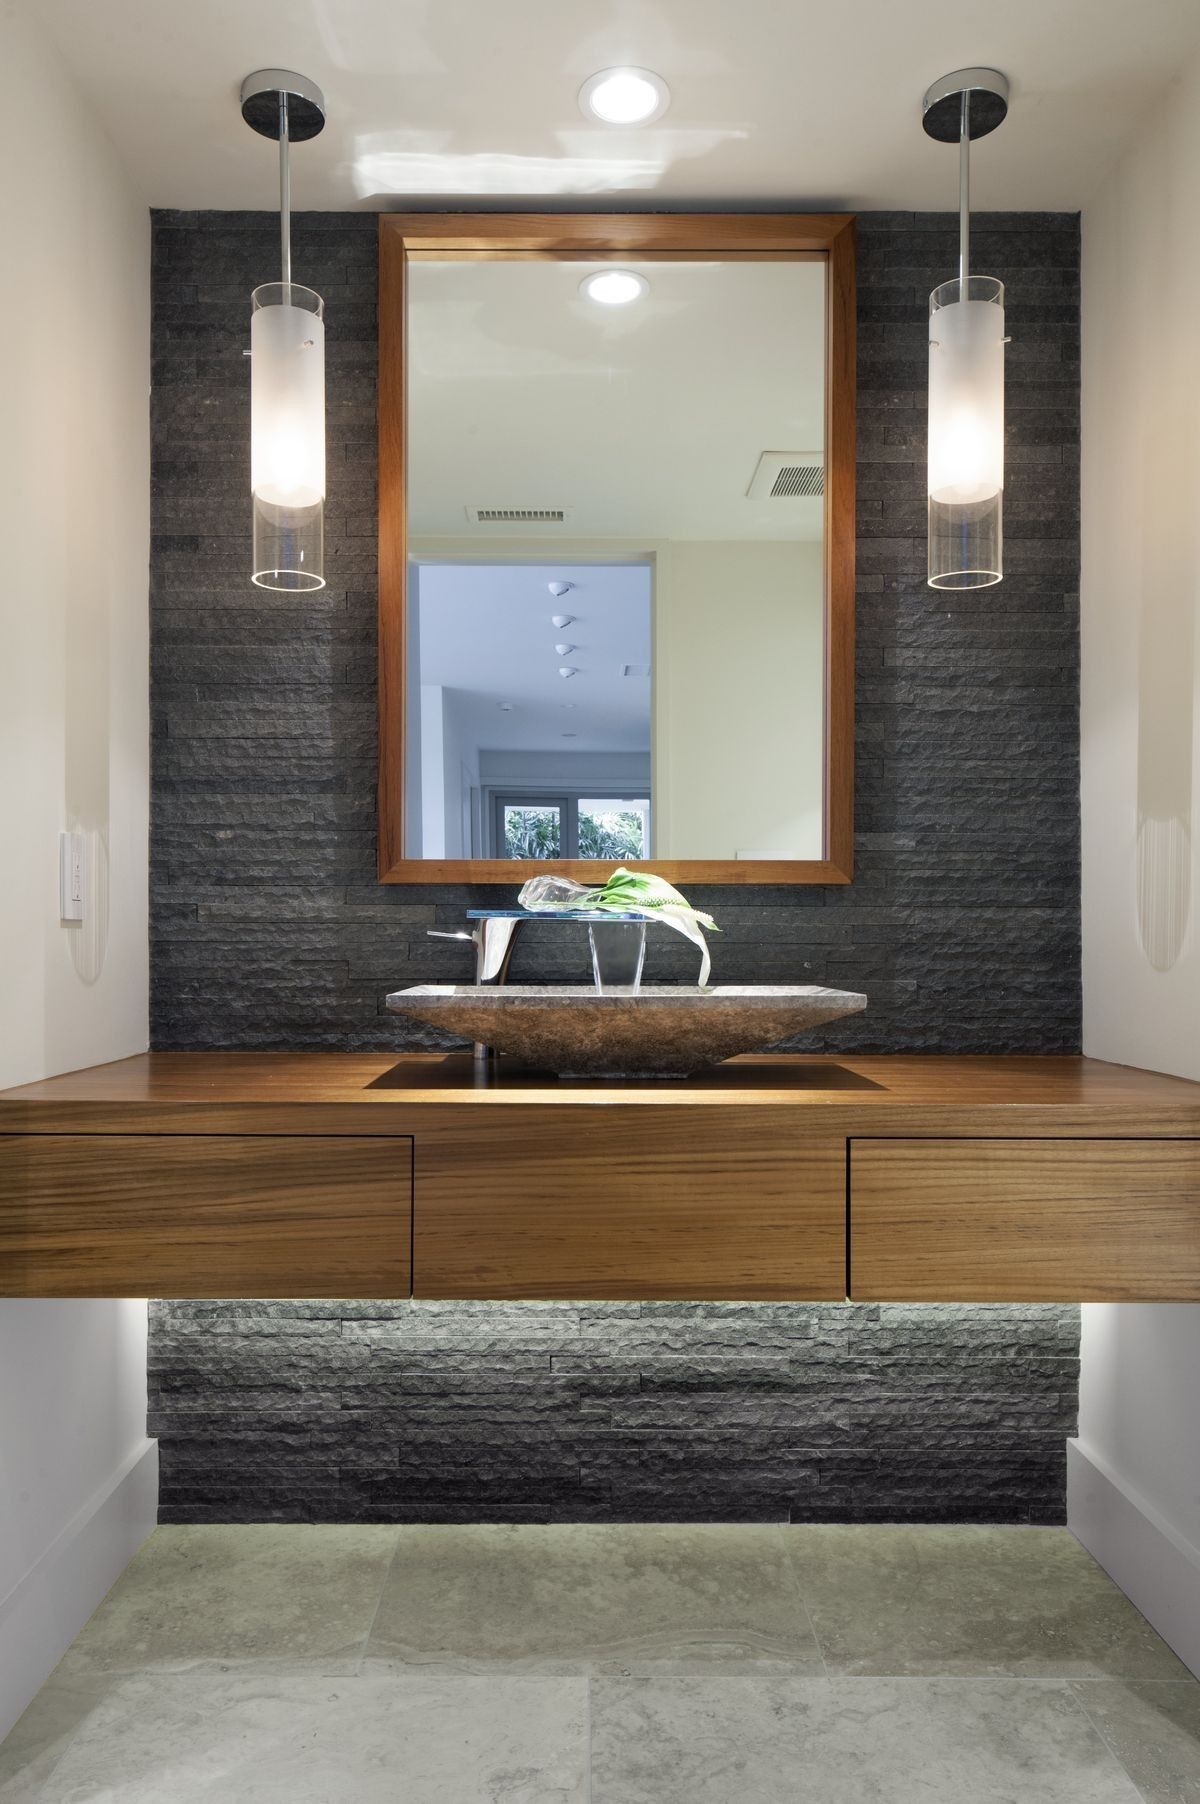 pinharmeet singh on home ideas  wallpaper accent wall